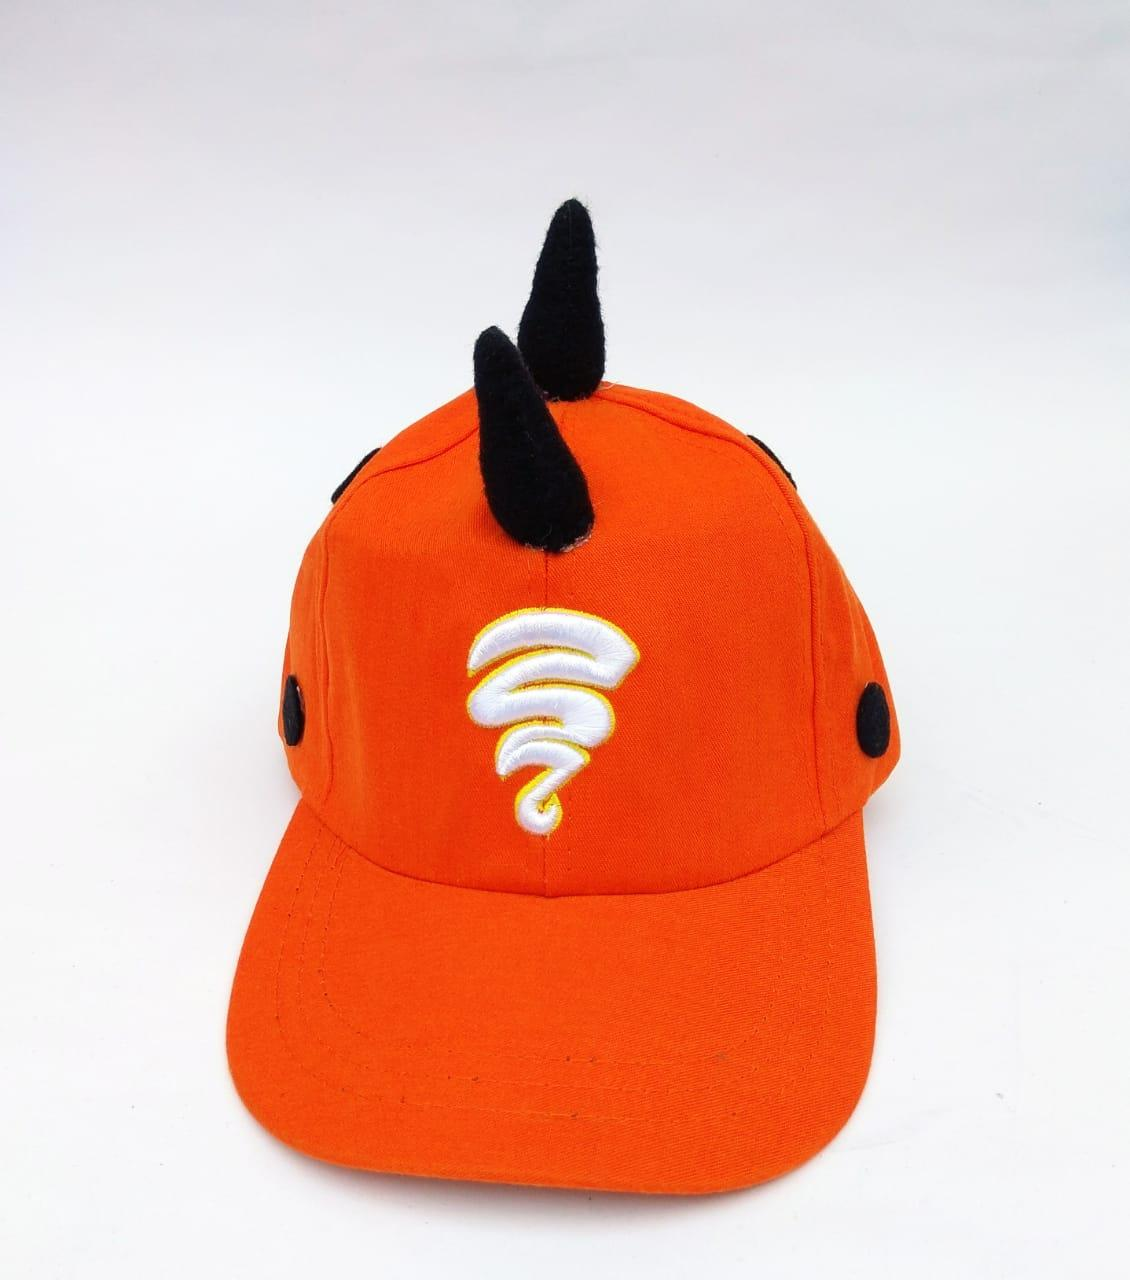 ajs store Topi anak boboiboy halilintar(Hitam)   Solar (Orange)   Api d0575e95a0